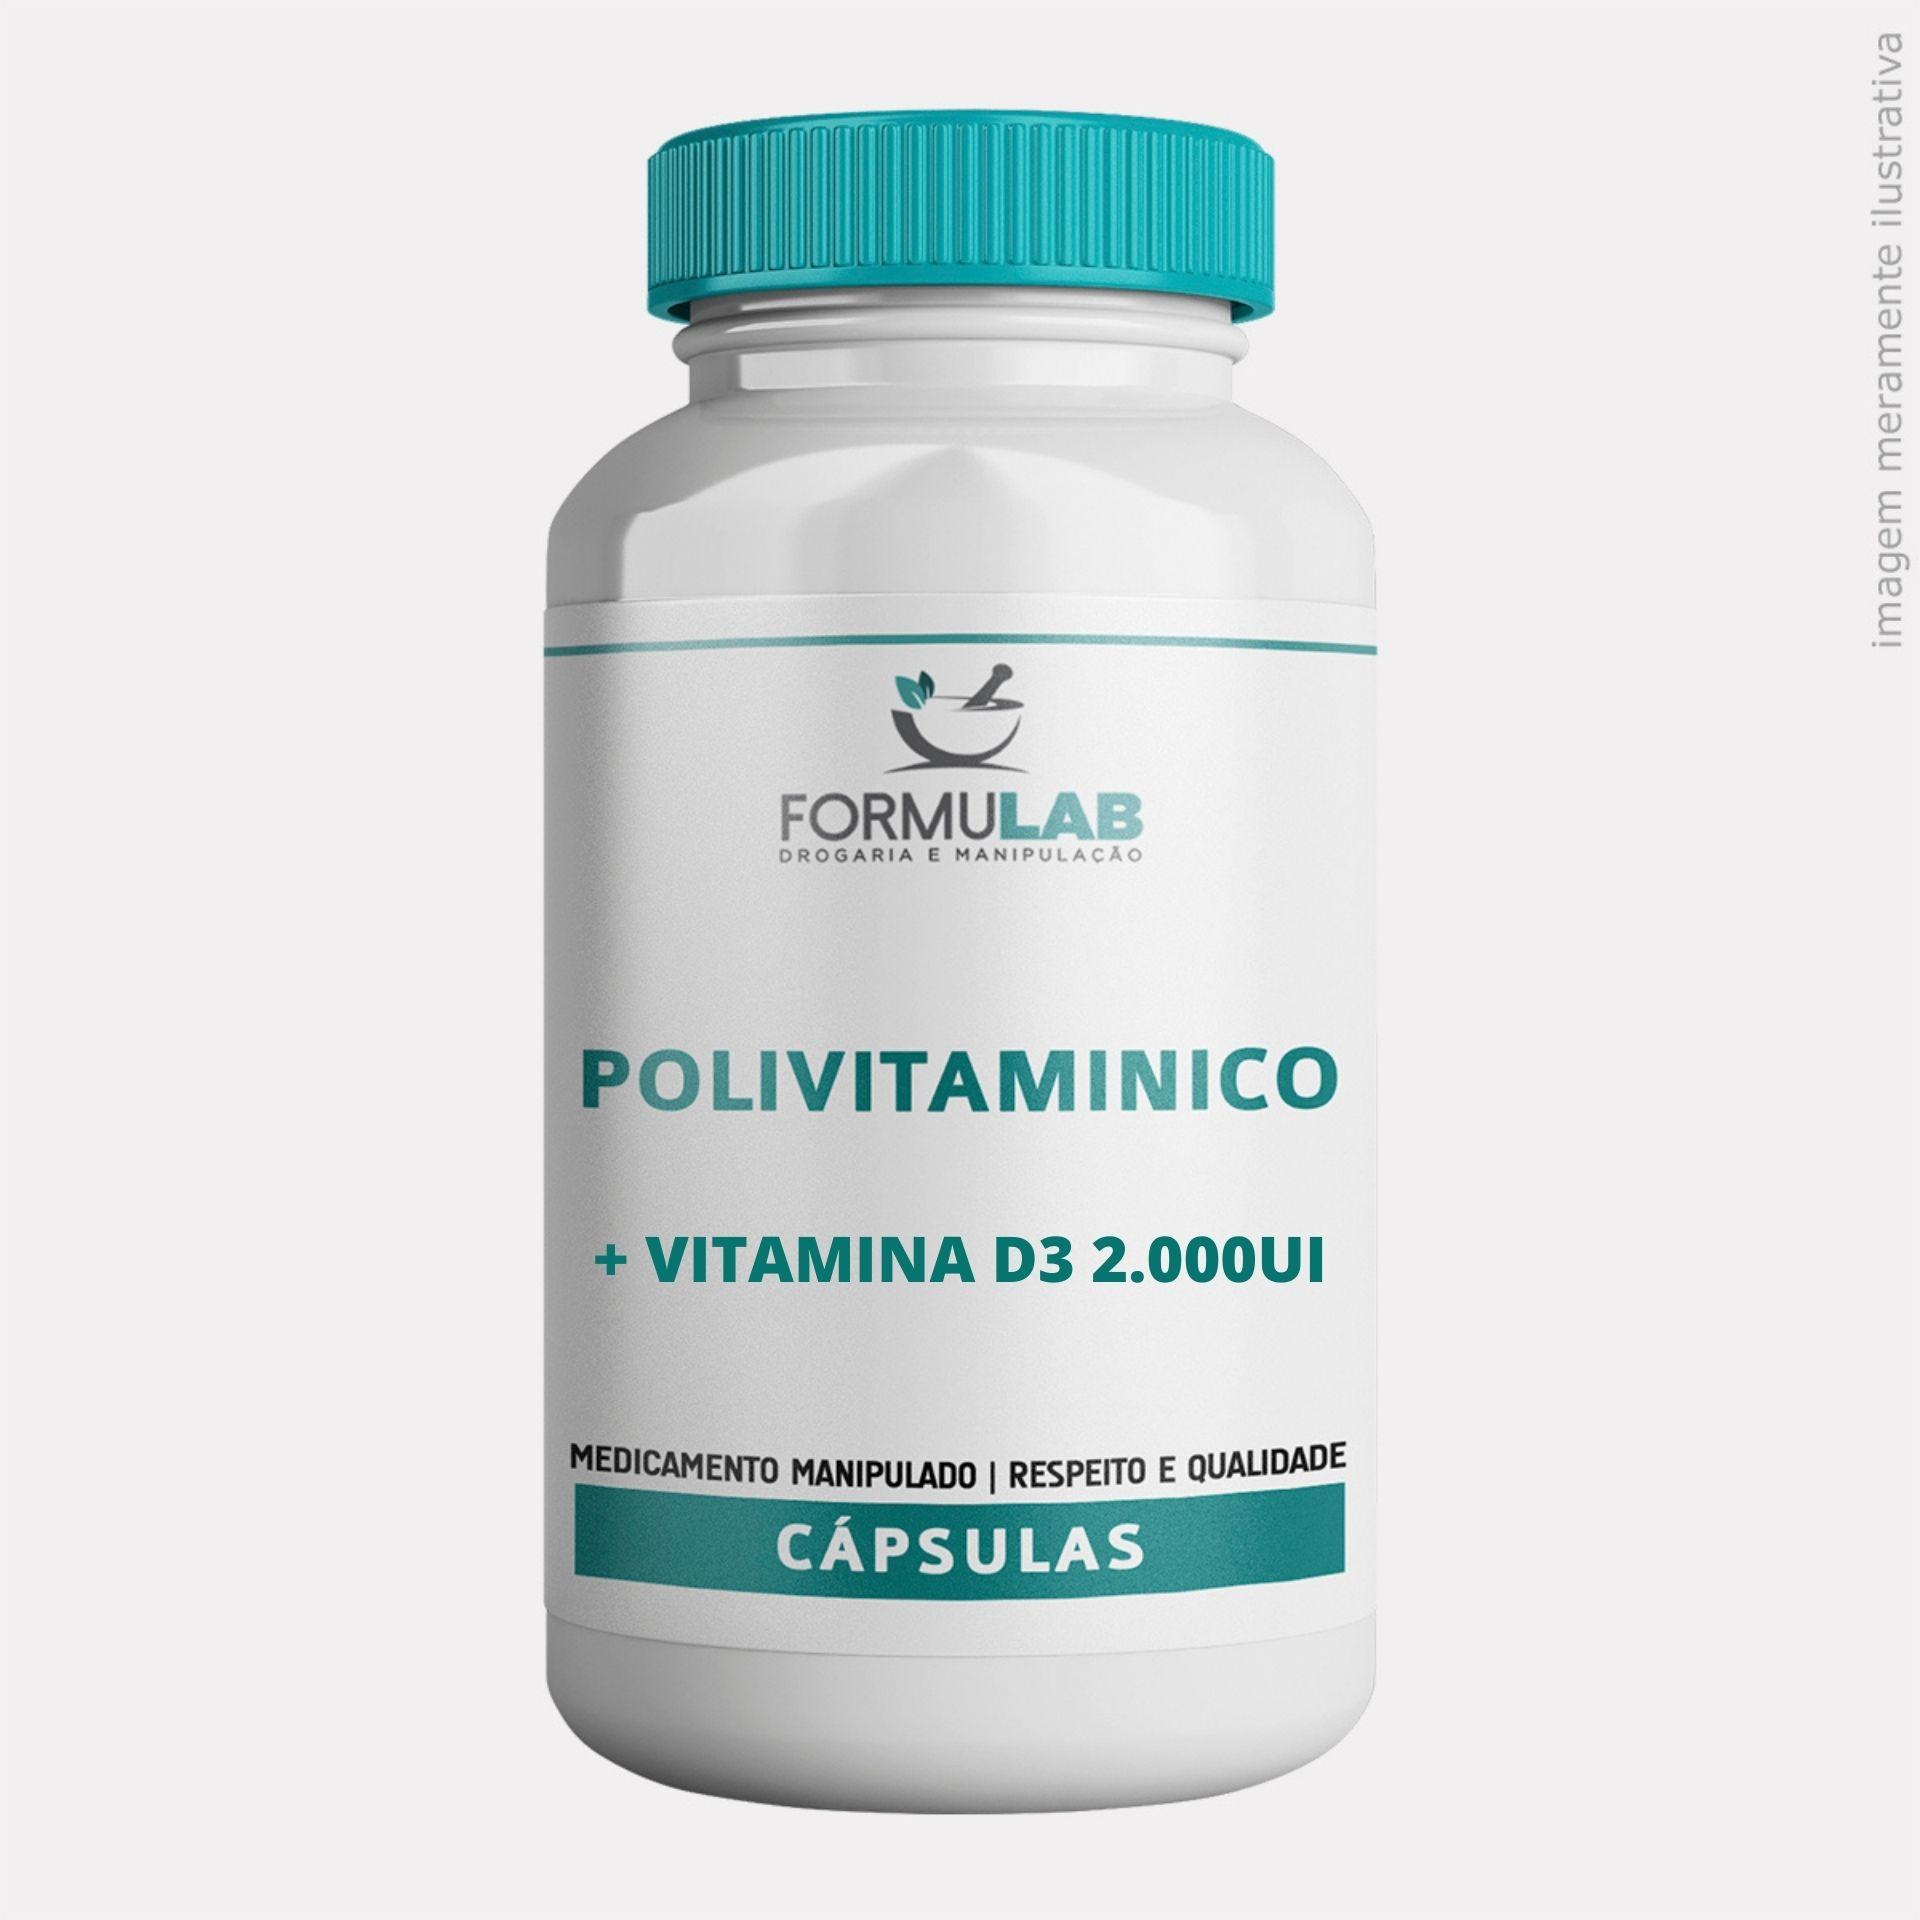 Kit Imunidade - POLIVITAMÍNICO QUELATO 30 Cápsulas + PRÓPOLIS 500mg 60 Cápsulas